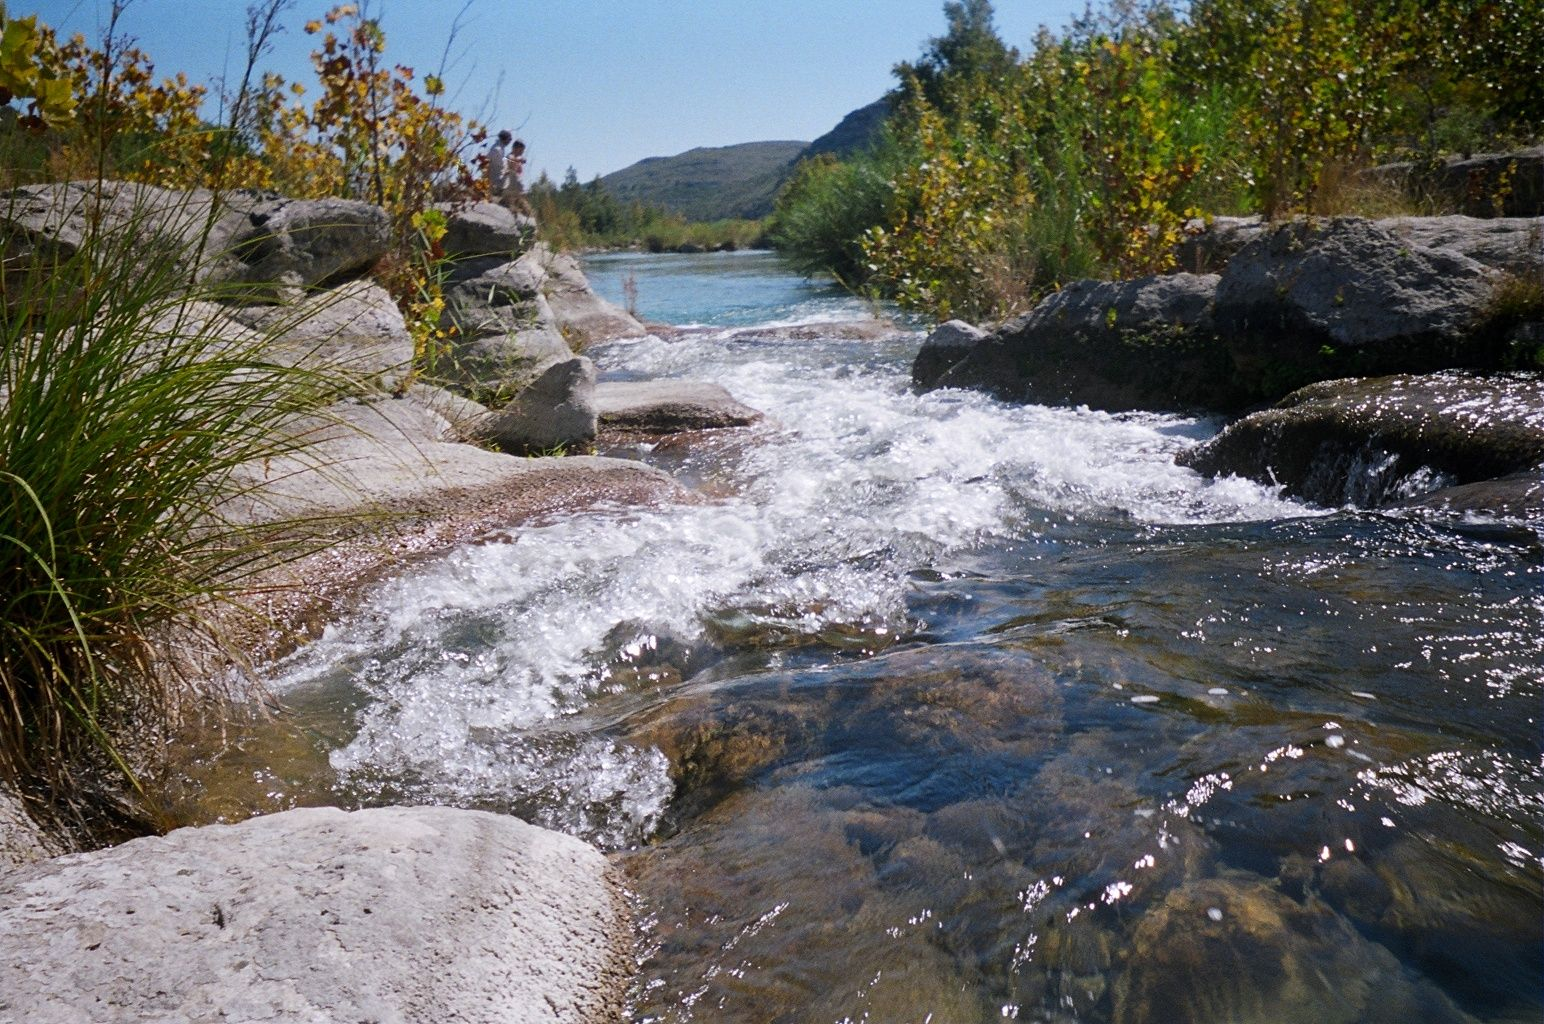 Devils River | Texas state parks, State parks, River